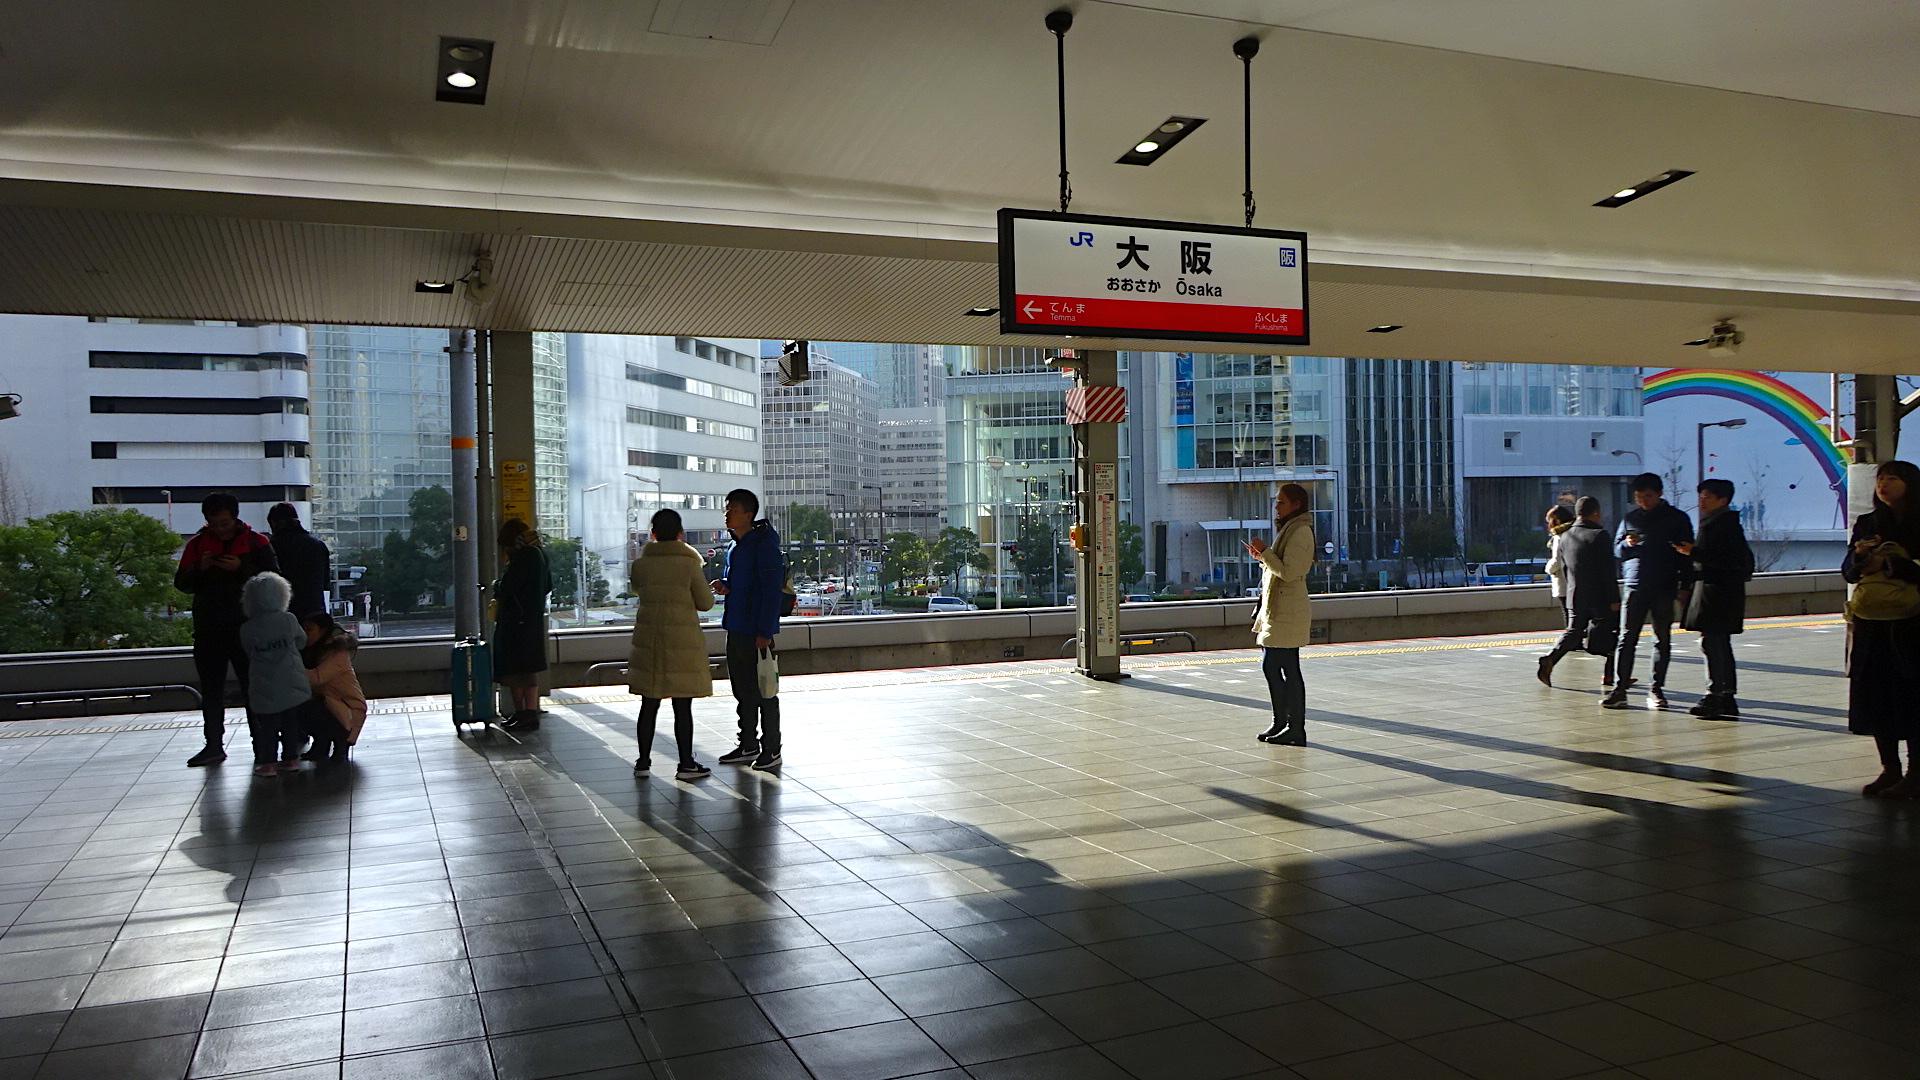 https://cdn-ak.f.st-hatena.com/images/fotolife/s/shioshiohida/20190117/20190117094336_original.jpg